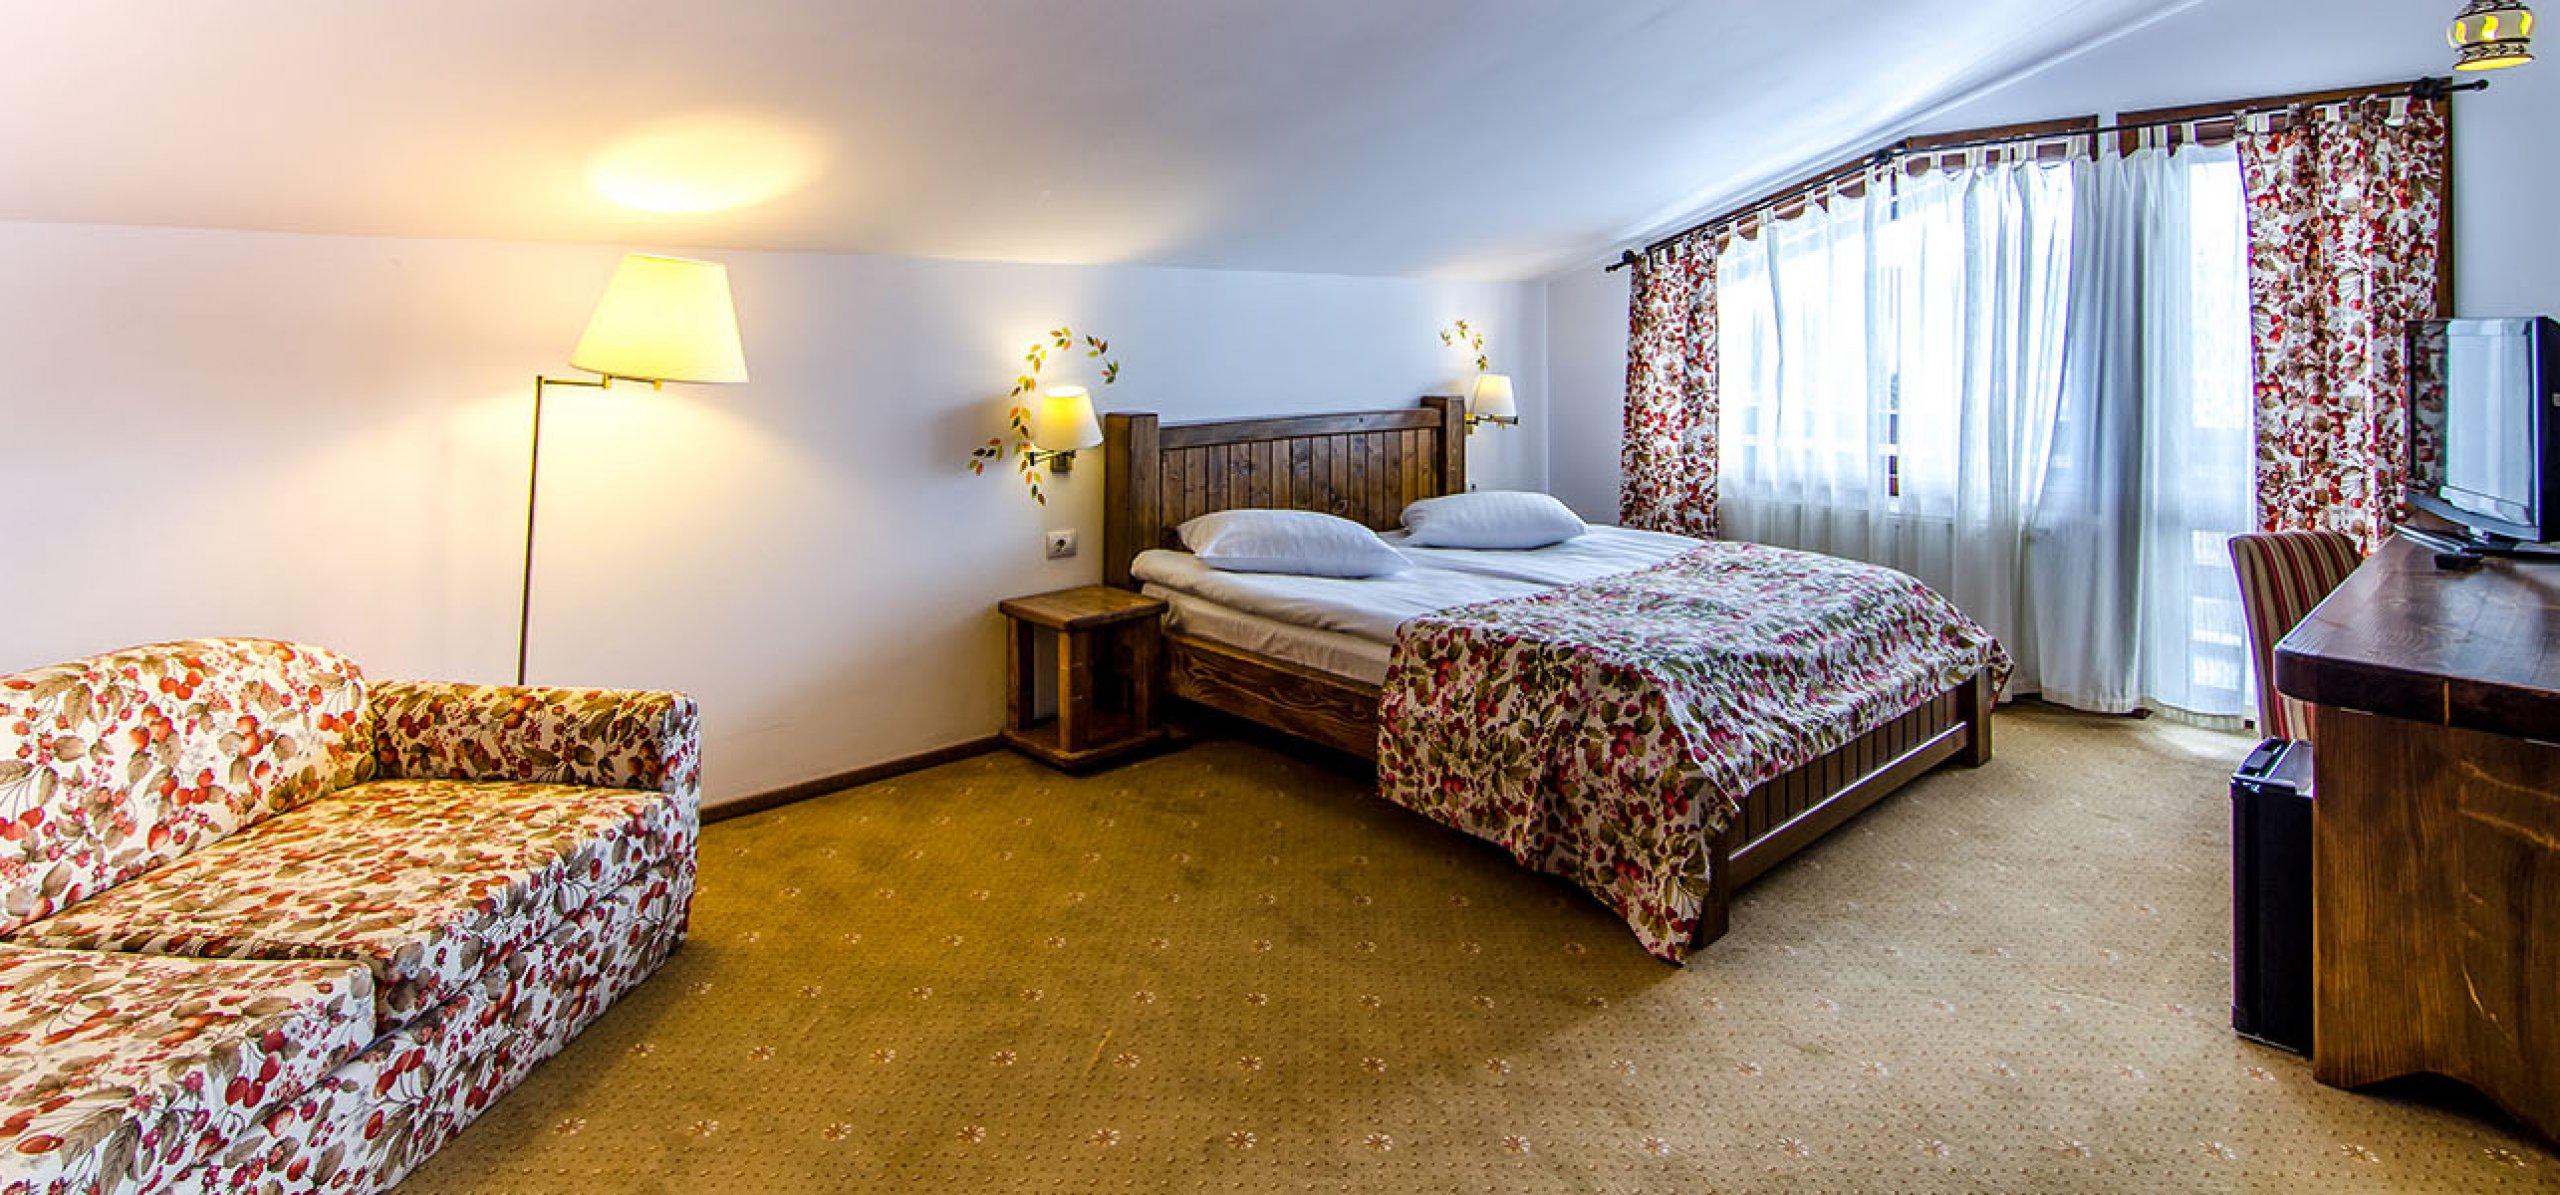 suita-1-camera-luminoasa-hotel-bucegi